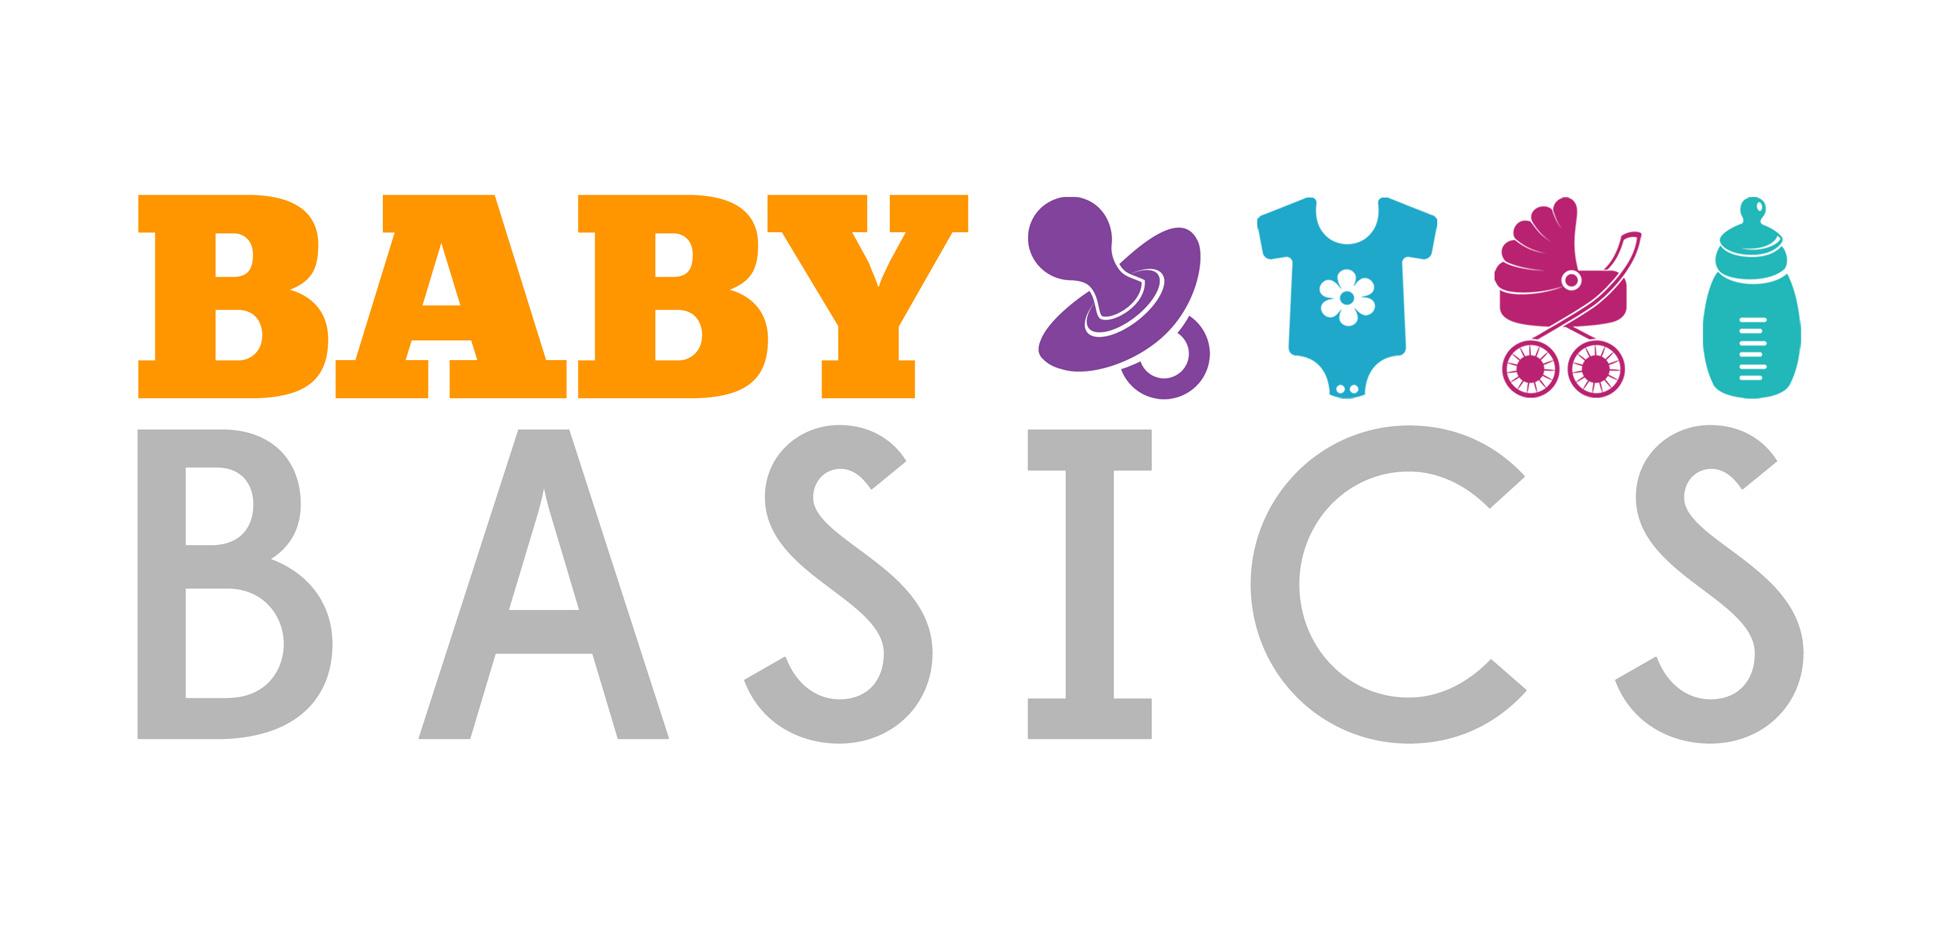 Baby-Basics-1.jpg